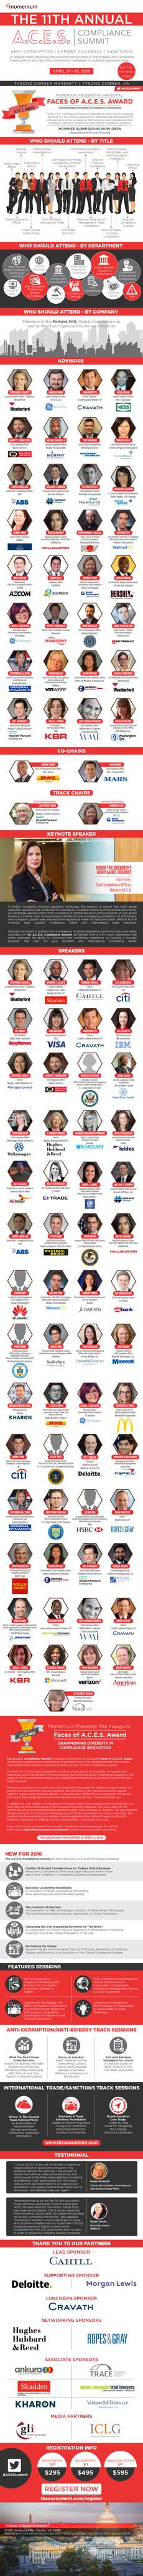 The 11th Annual A.C.E.S Compliance Summit